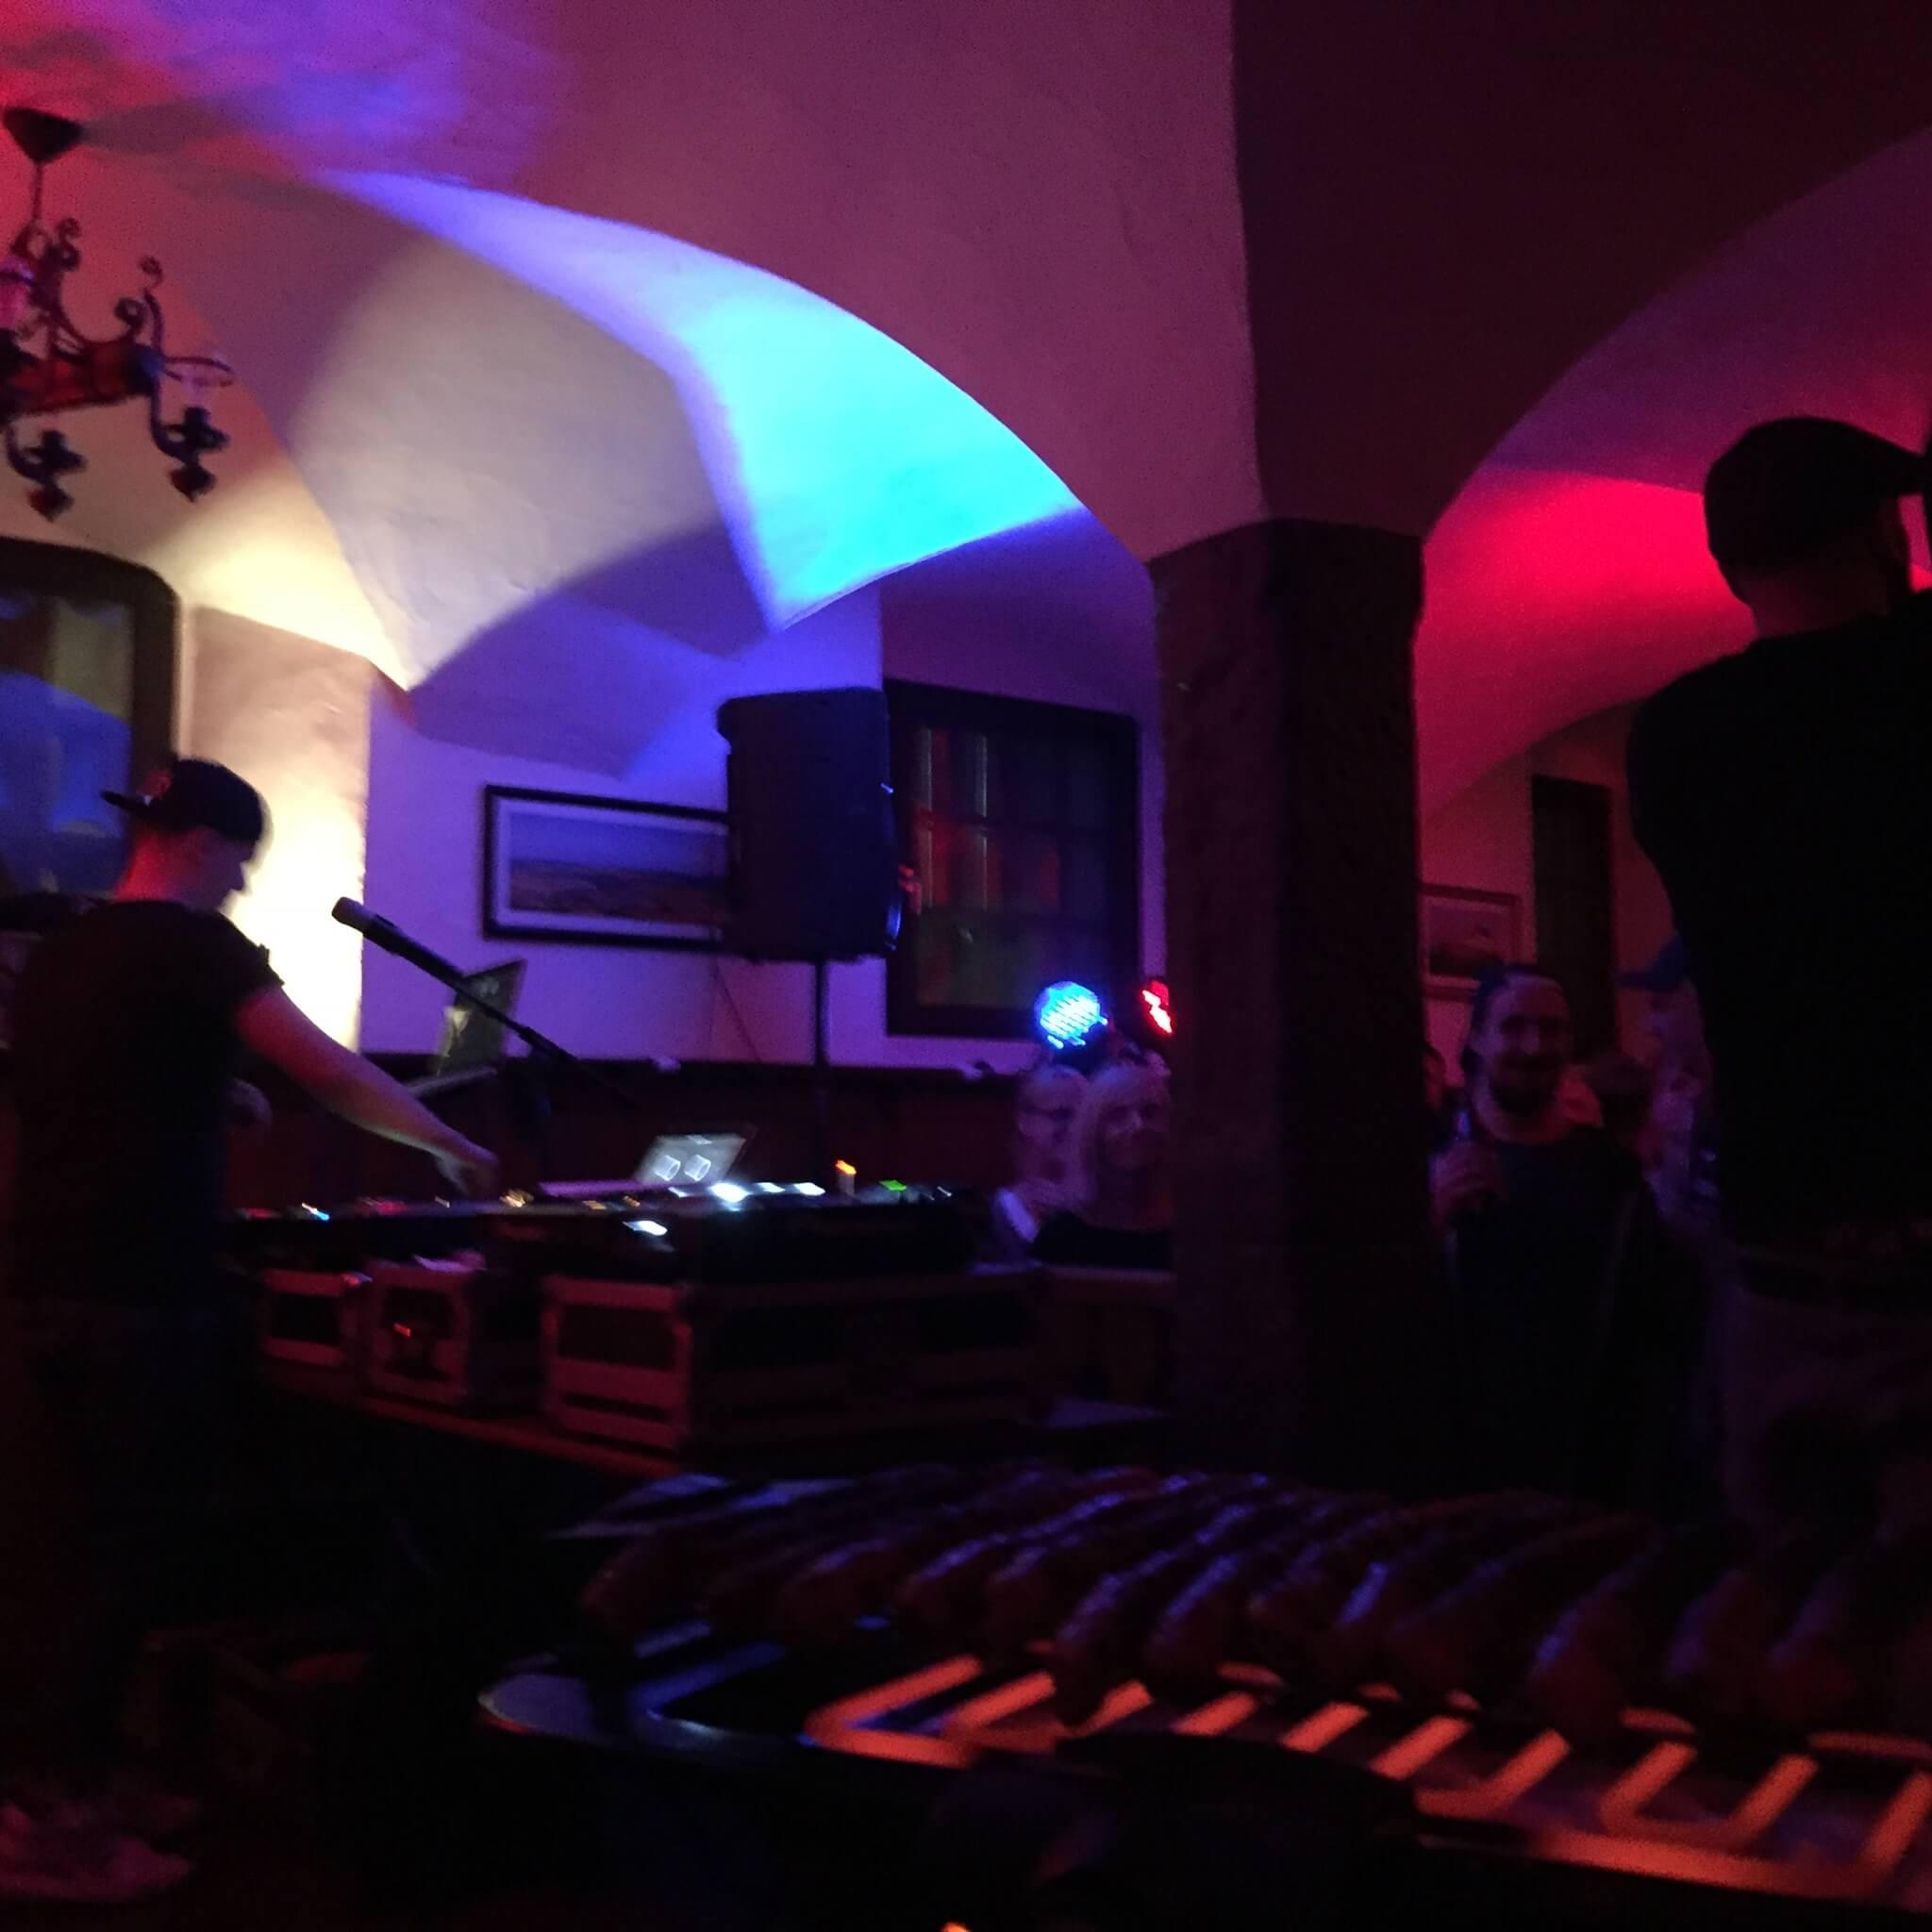 Rofl Royce und Heinz Null. Company Slow. Frankenburger. Live Hip Hop. Bratwurst Rap. Coburg.